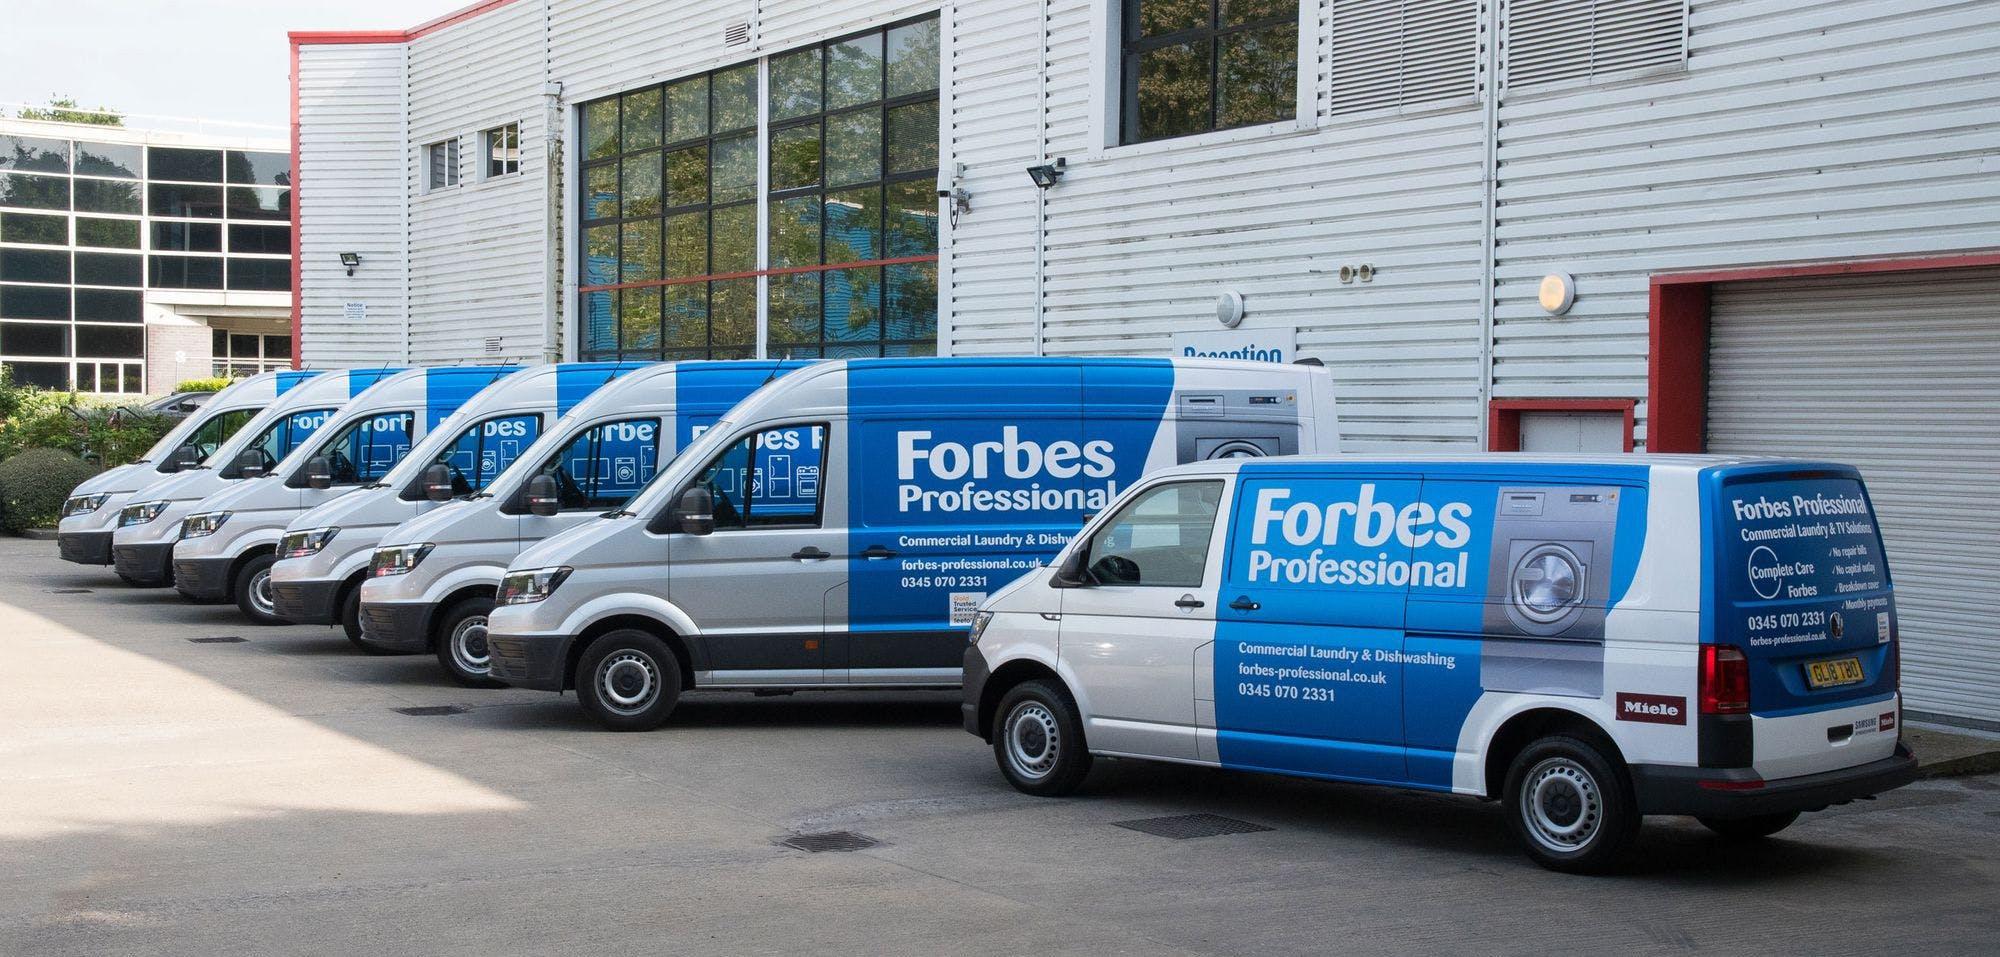 Forbes acquires Claridge Electricals' rental accounts